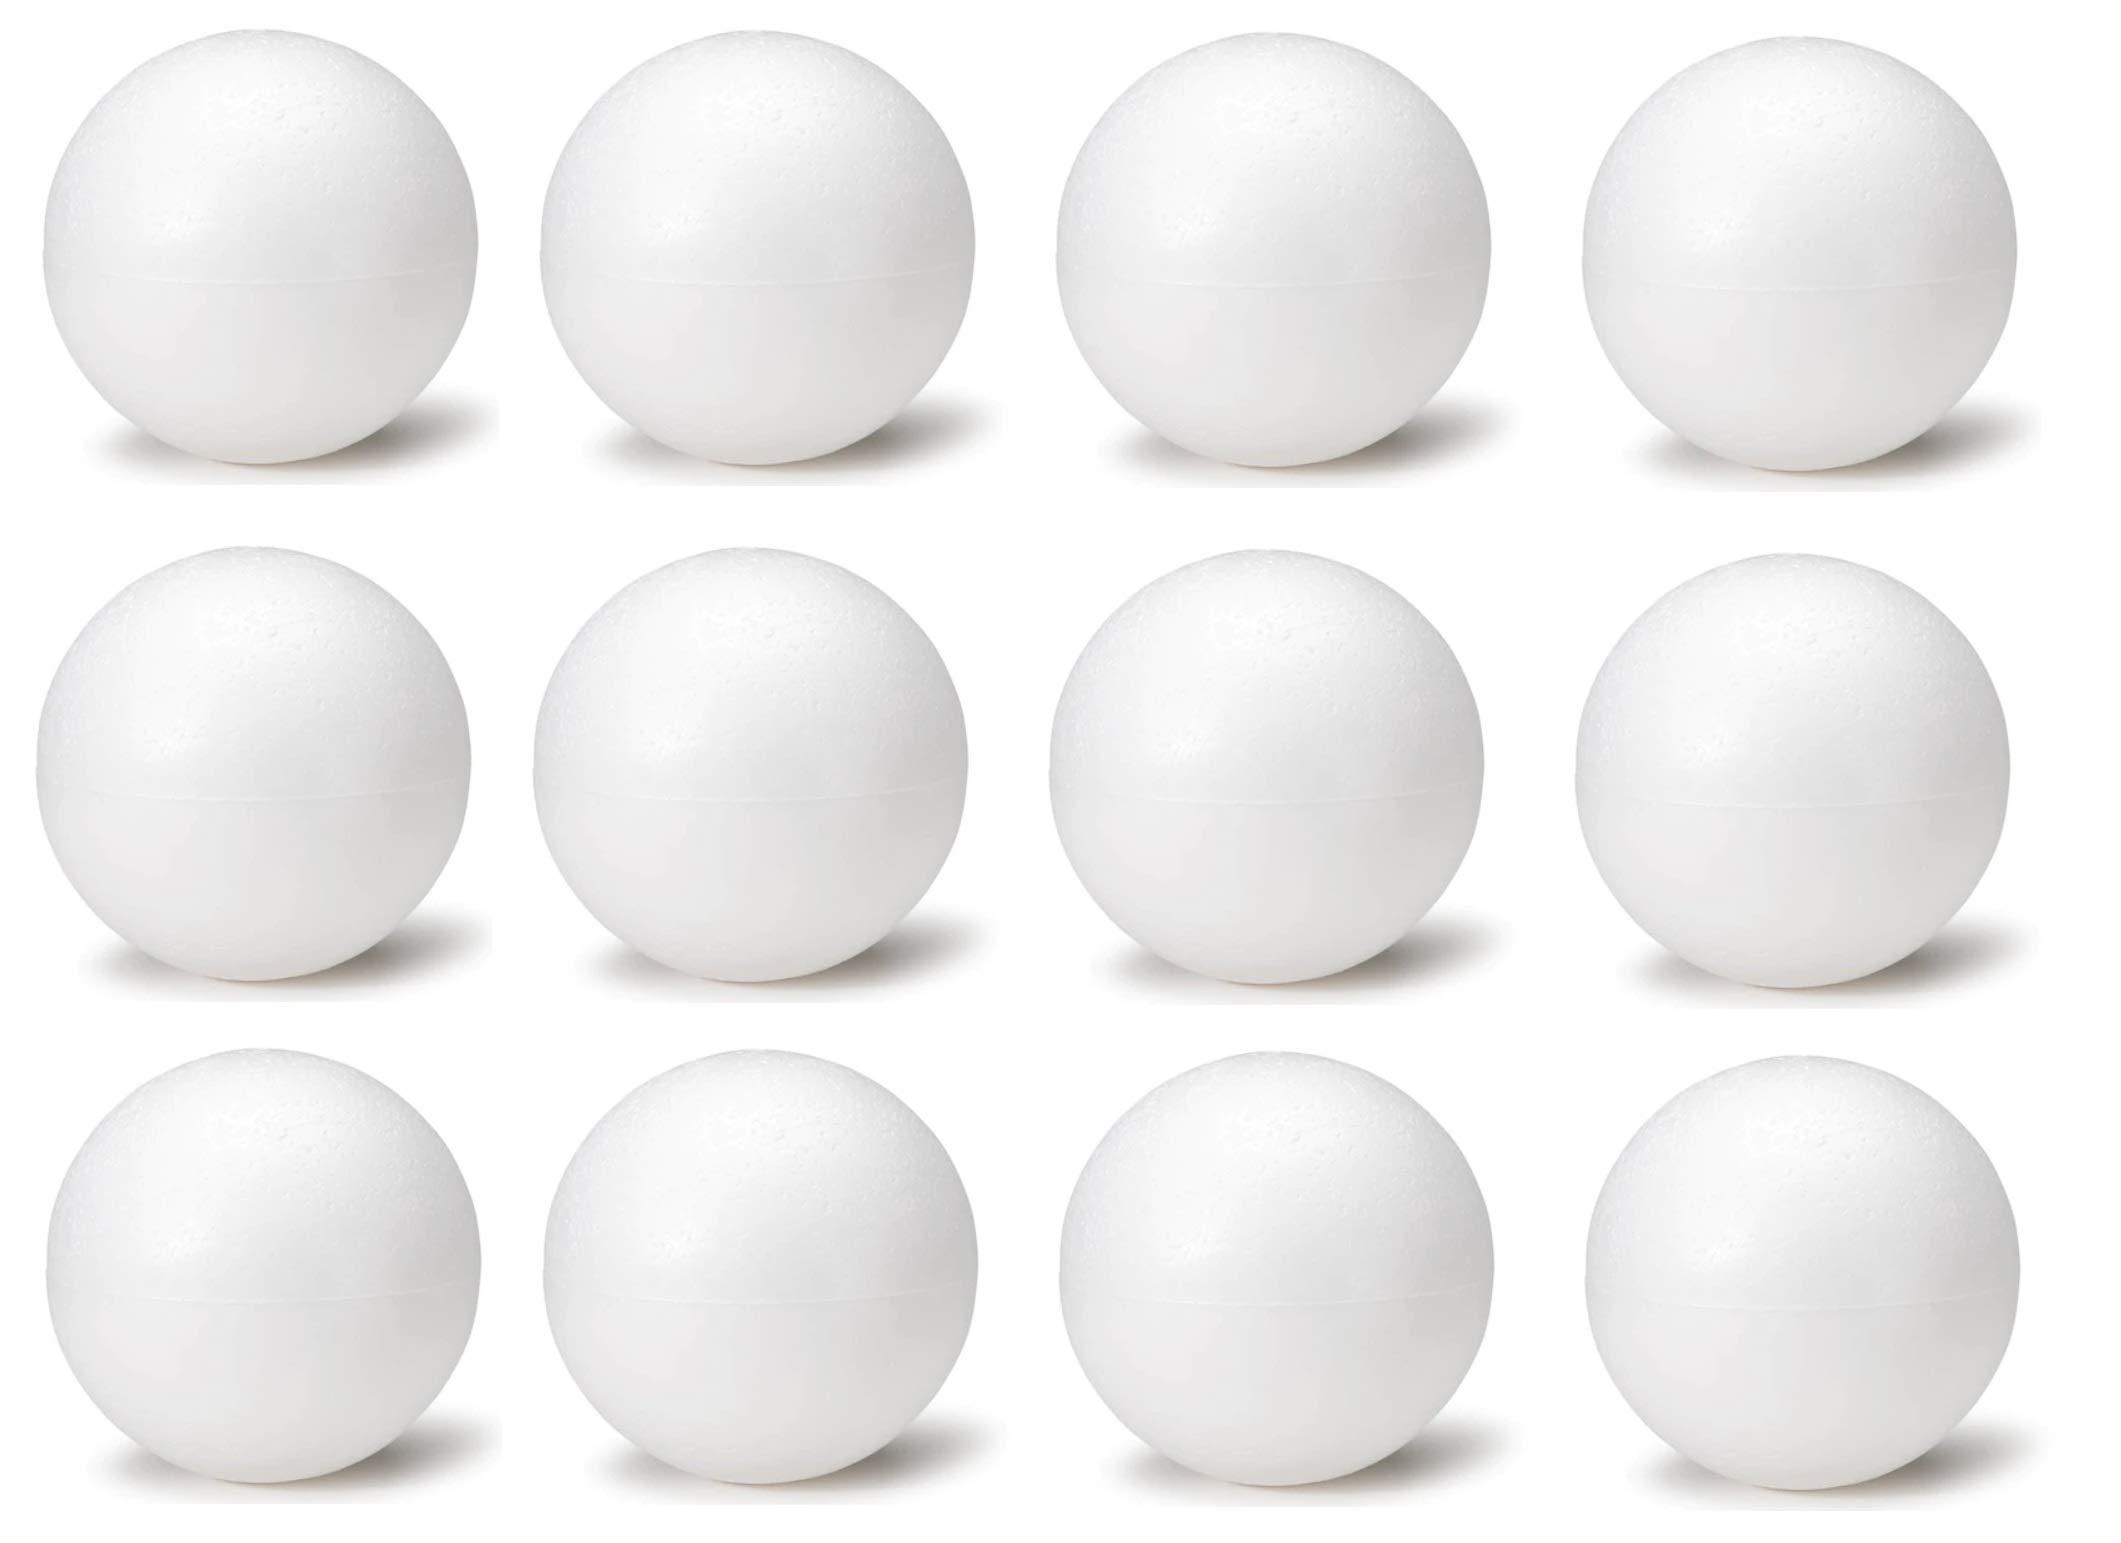 6 Inch White Foam Craft Balls for Art & Crafts Projects Foam Polystyrene Balls (12)